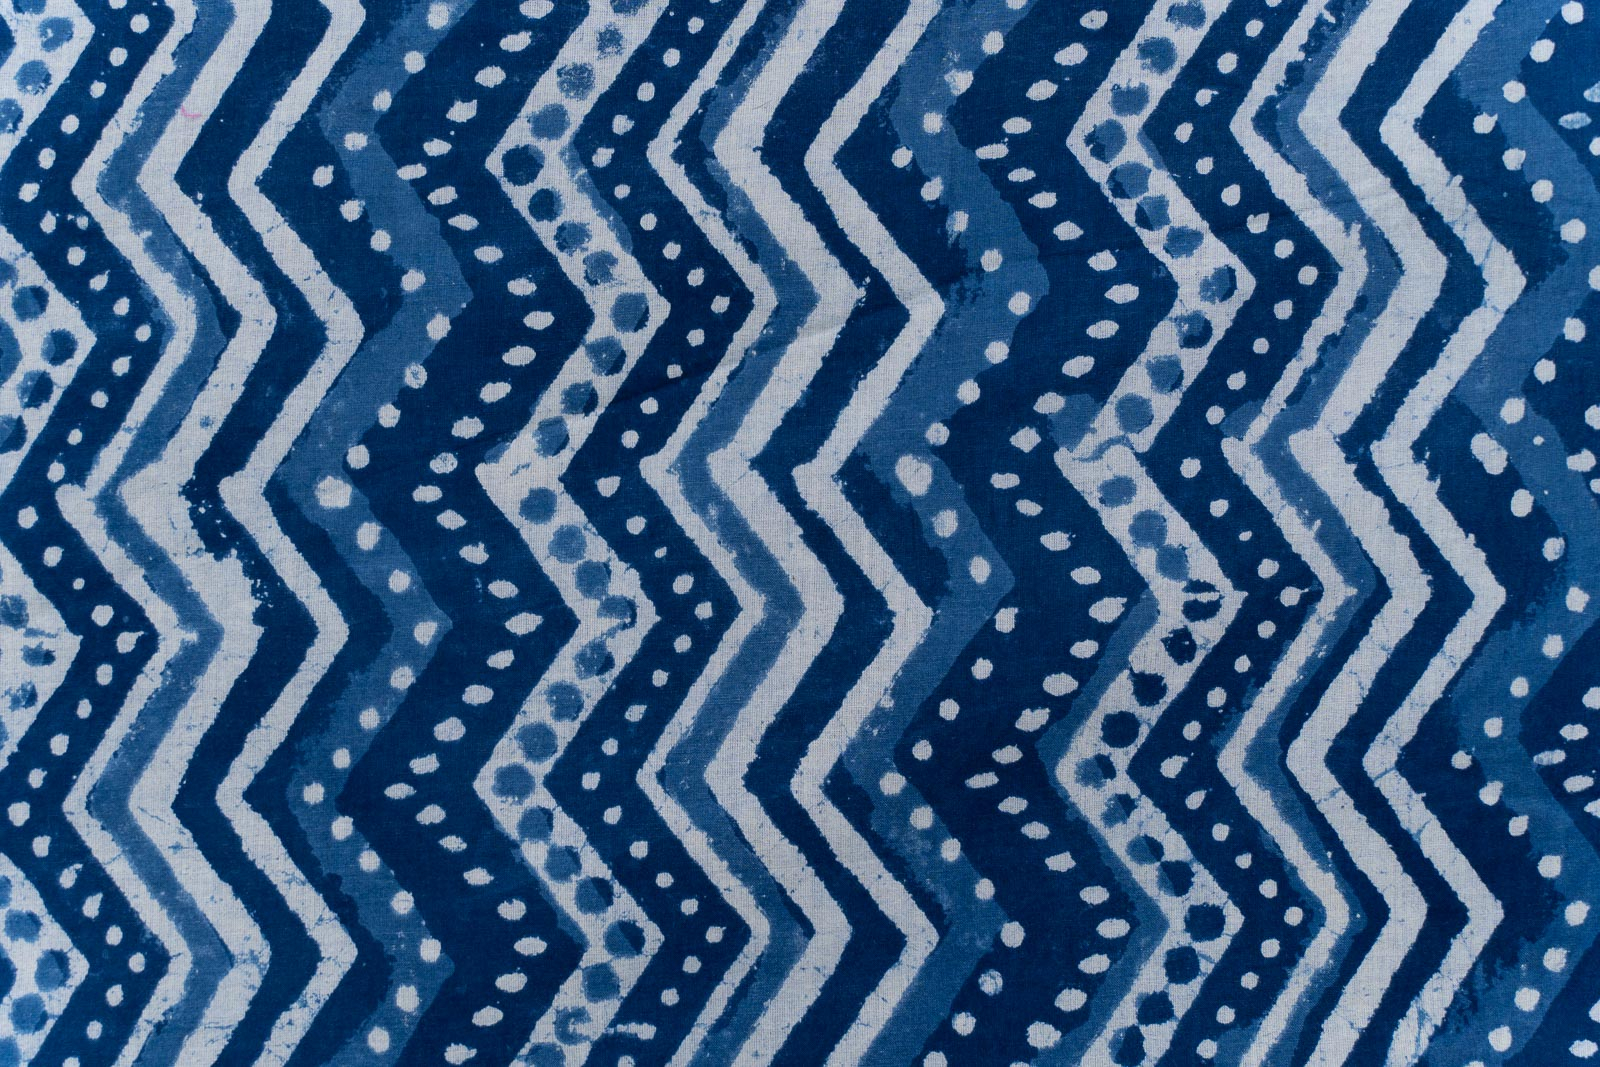 Indigo Chevron Block Printed Fabric